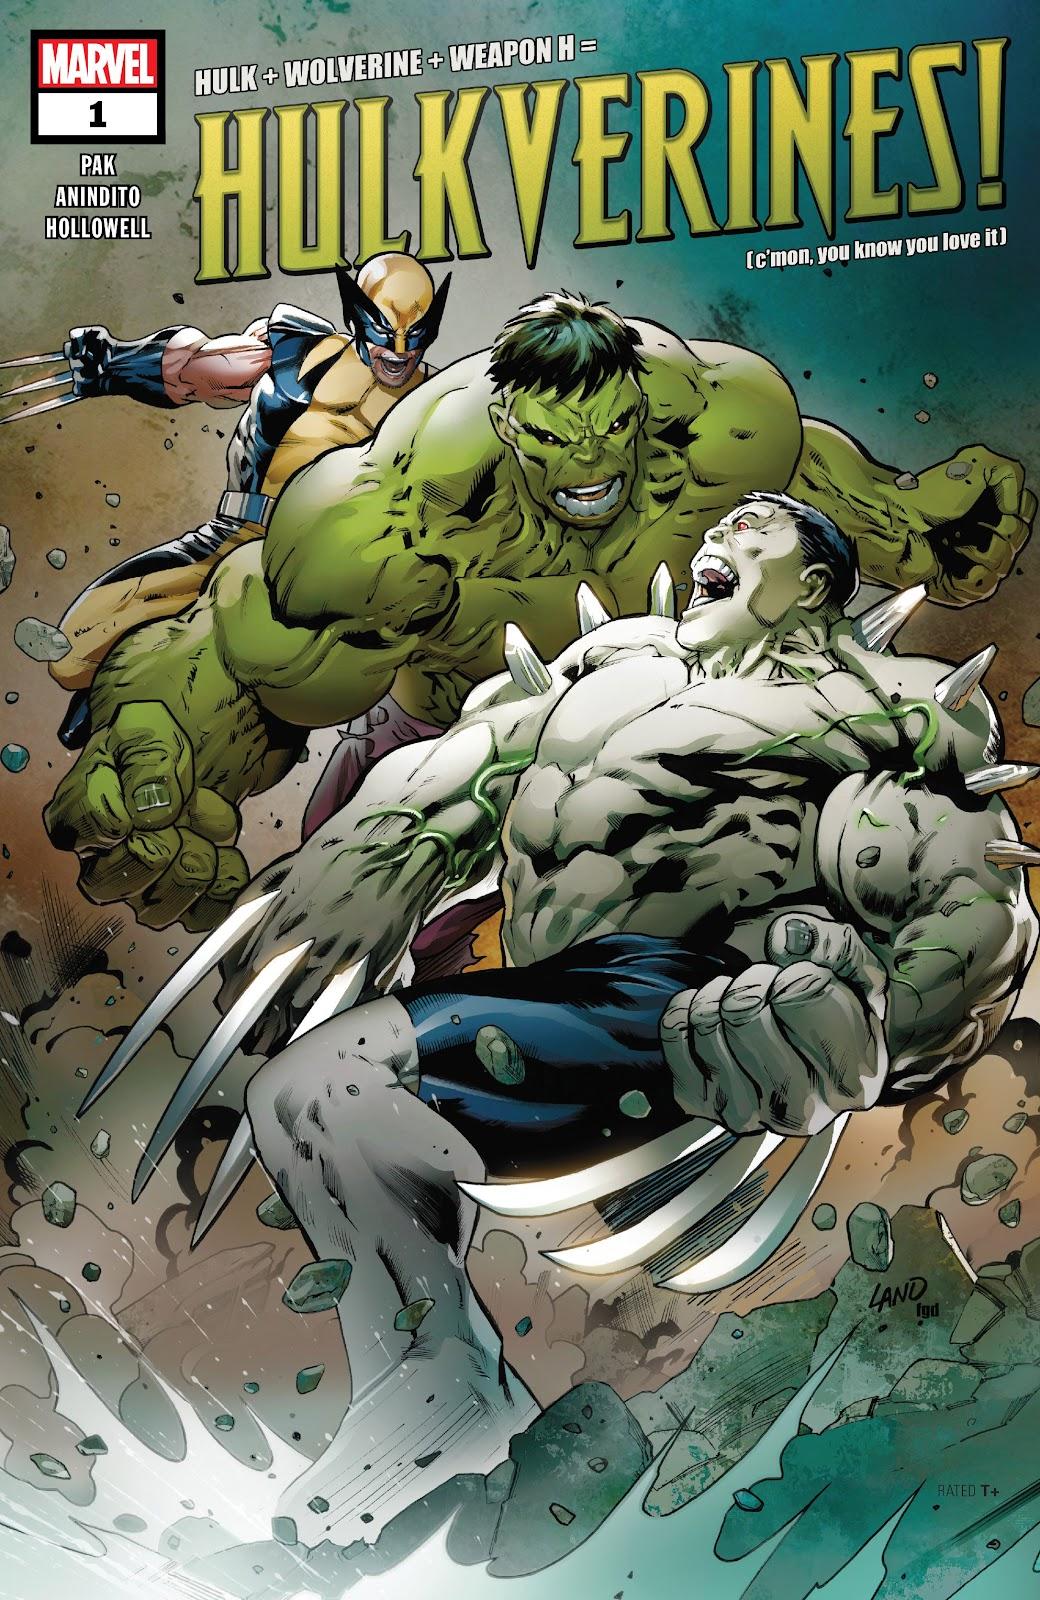 Read online Hulkverines comic -  Issue #1 - 1